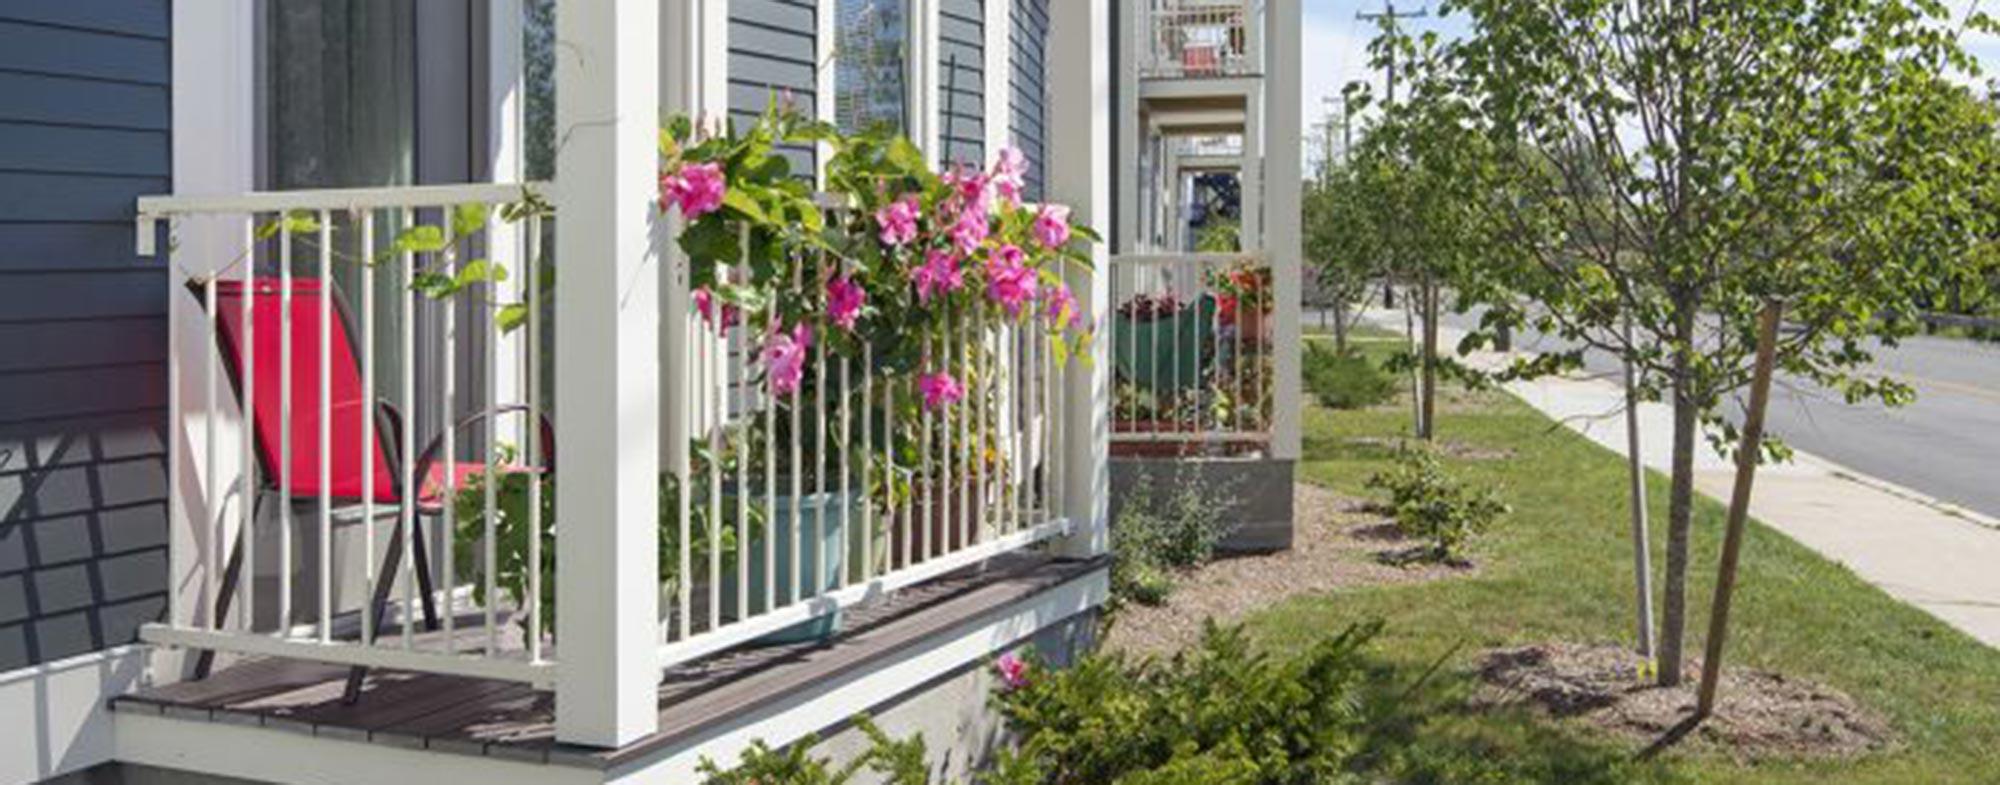 boston affordable housing